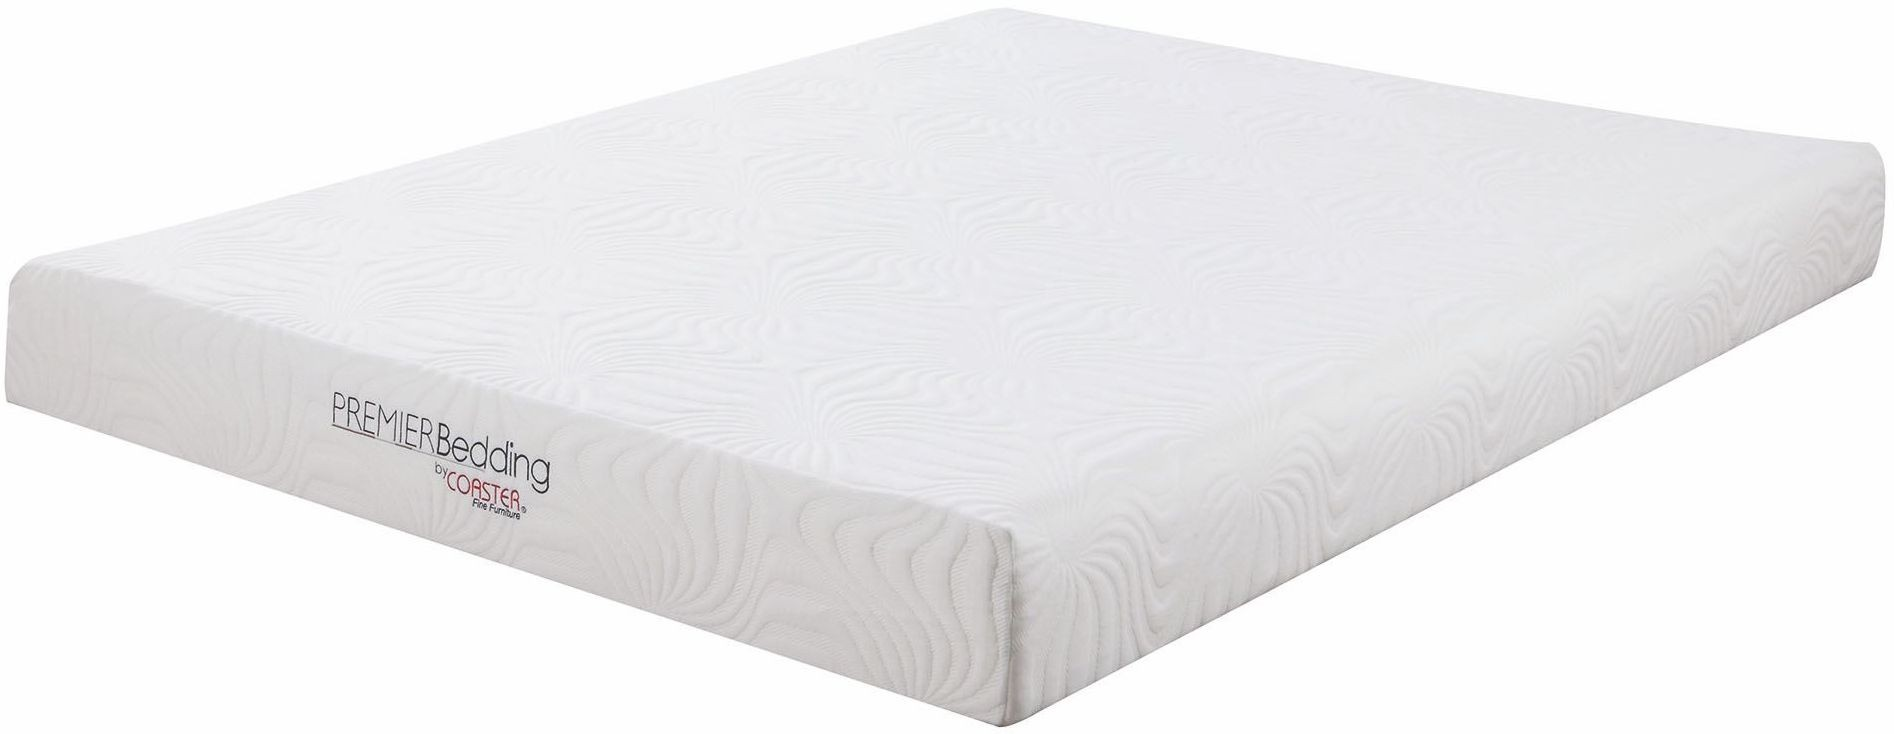 Keegan 8 Cal King Memory Foam Mattress From Coaster Coleman Furniture